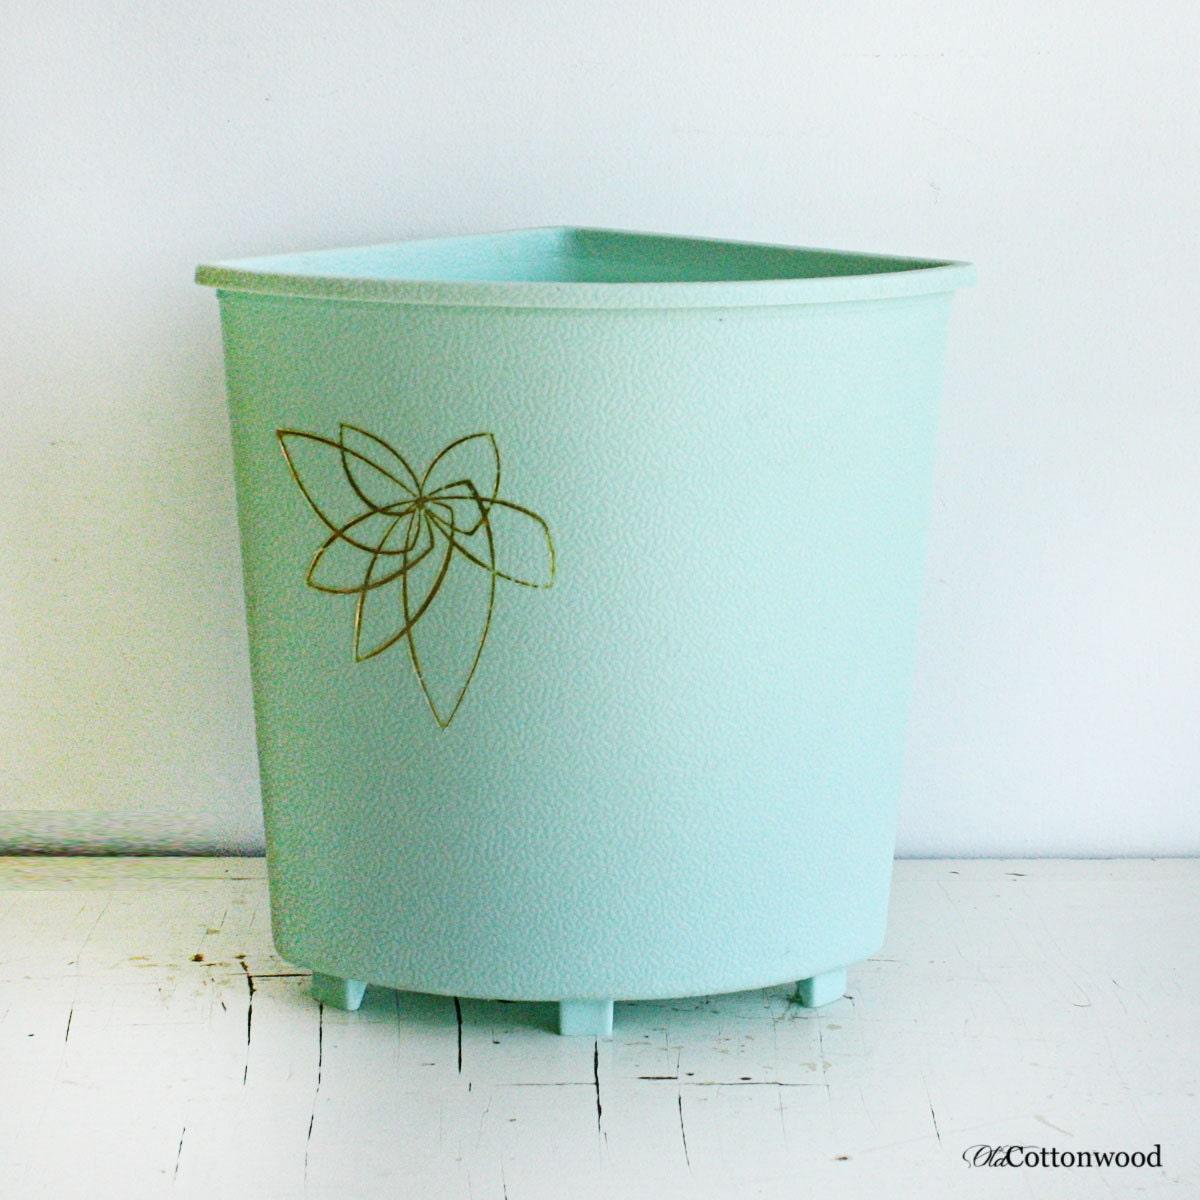 Vintage corner trash can mint light blue bathroom decor for Light blue bathroom accessories